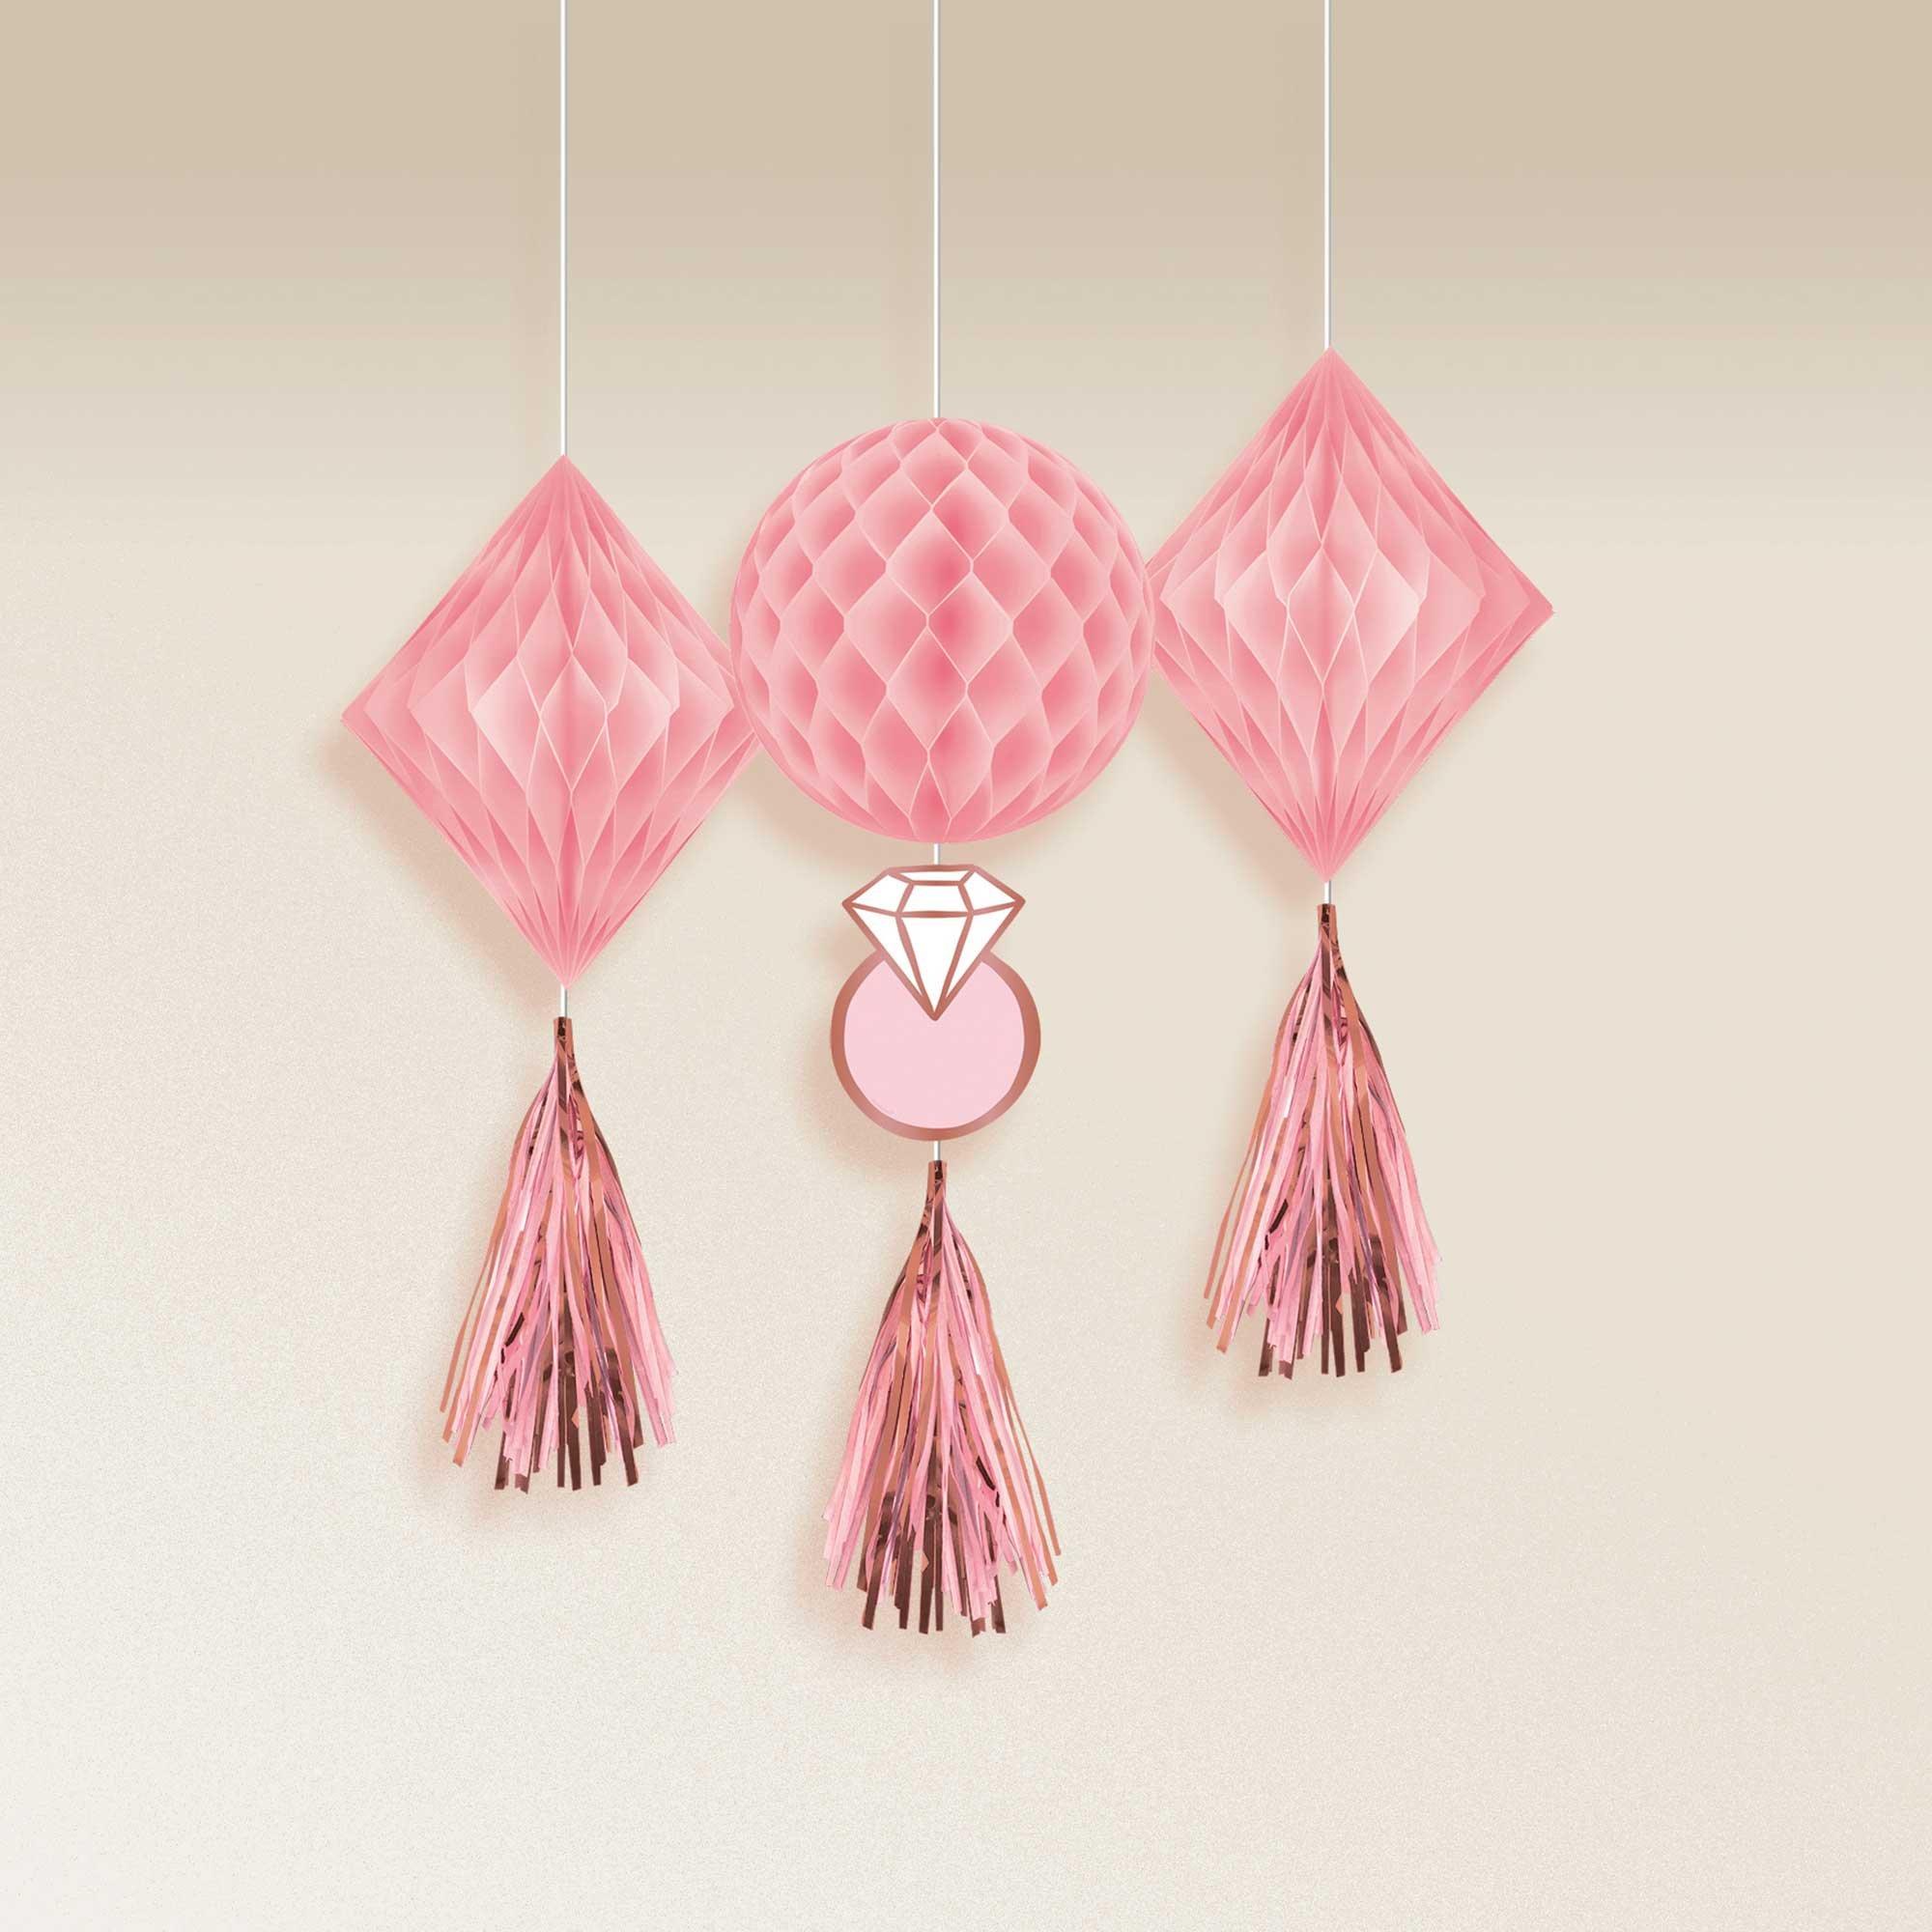 Blush Wedding Honeycomb Hanging Decorations